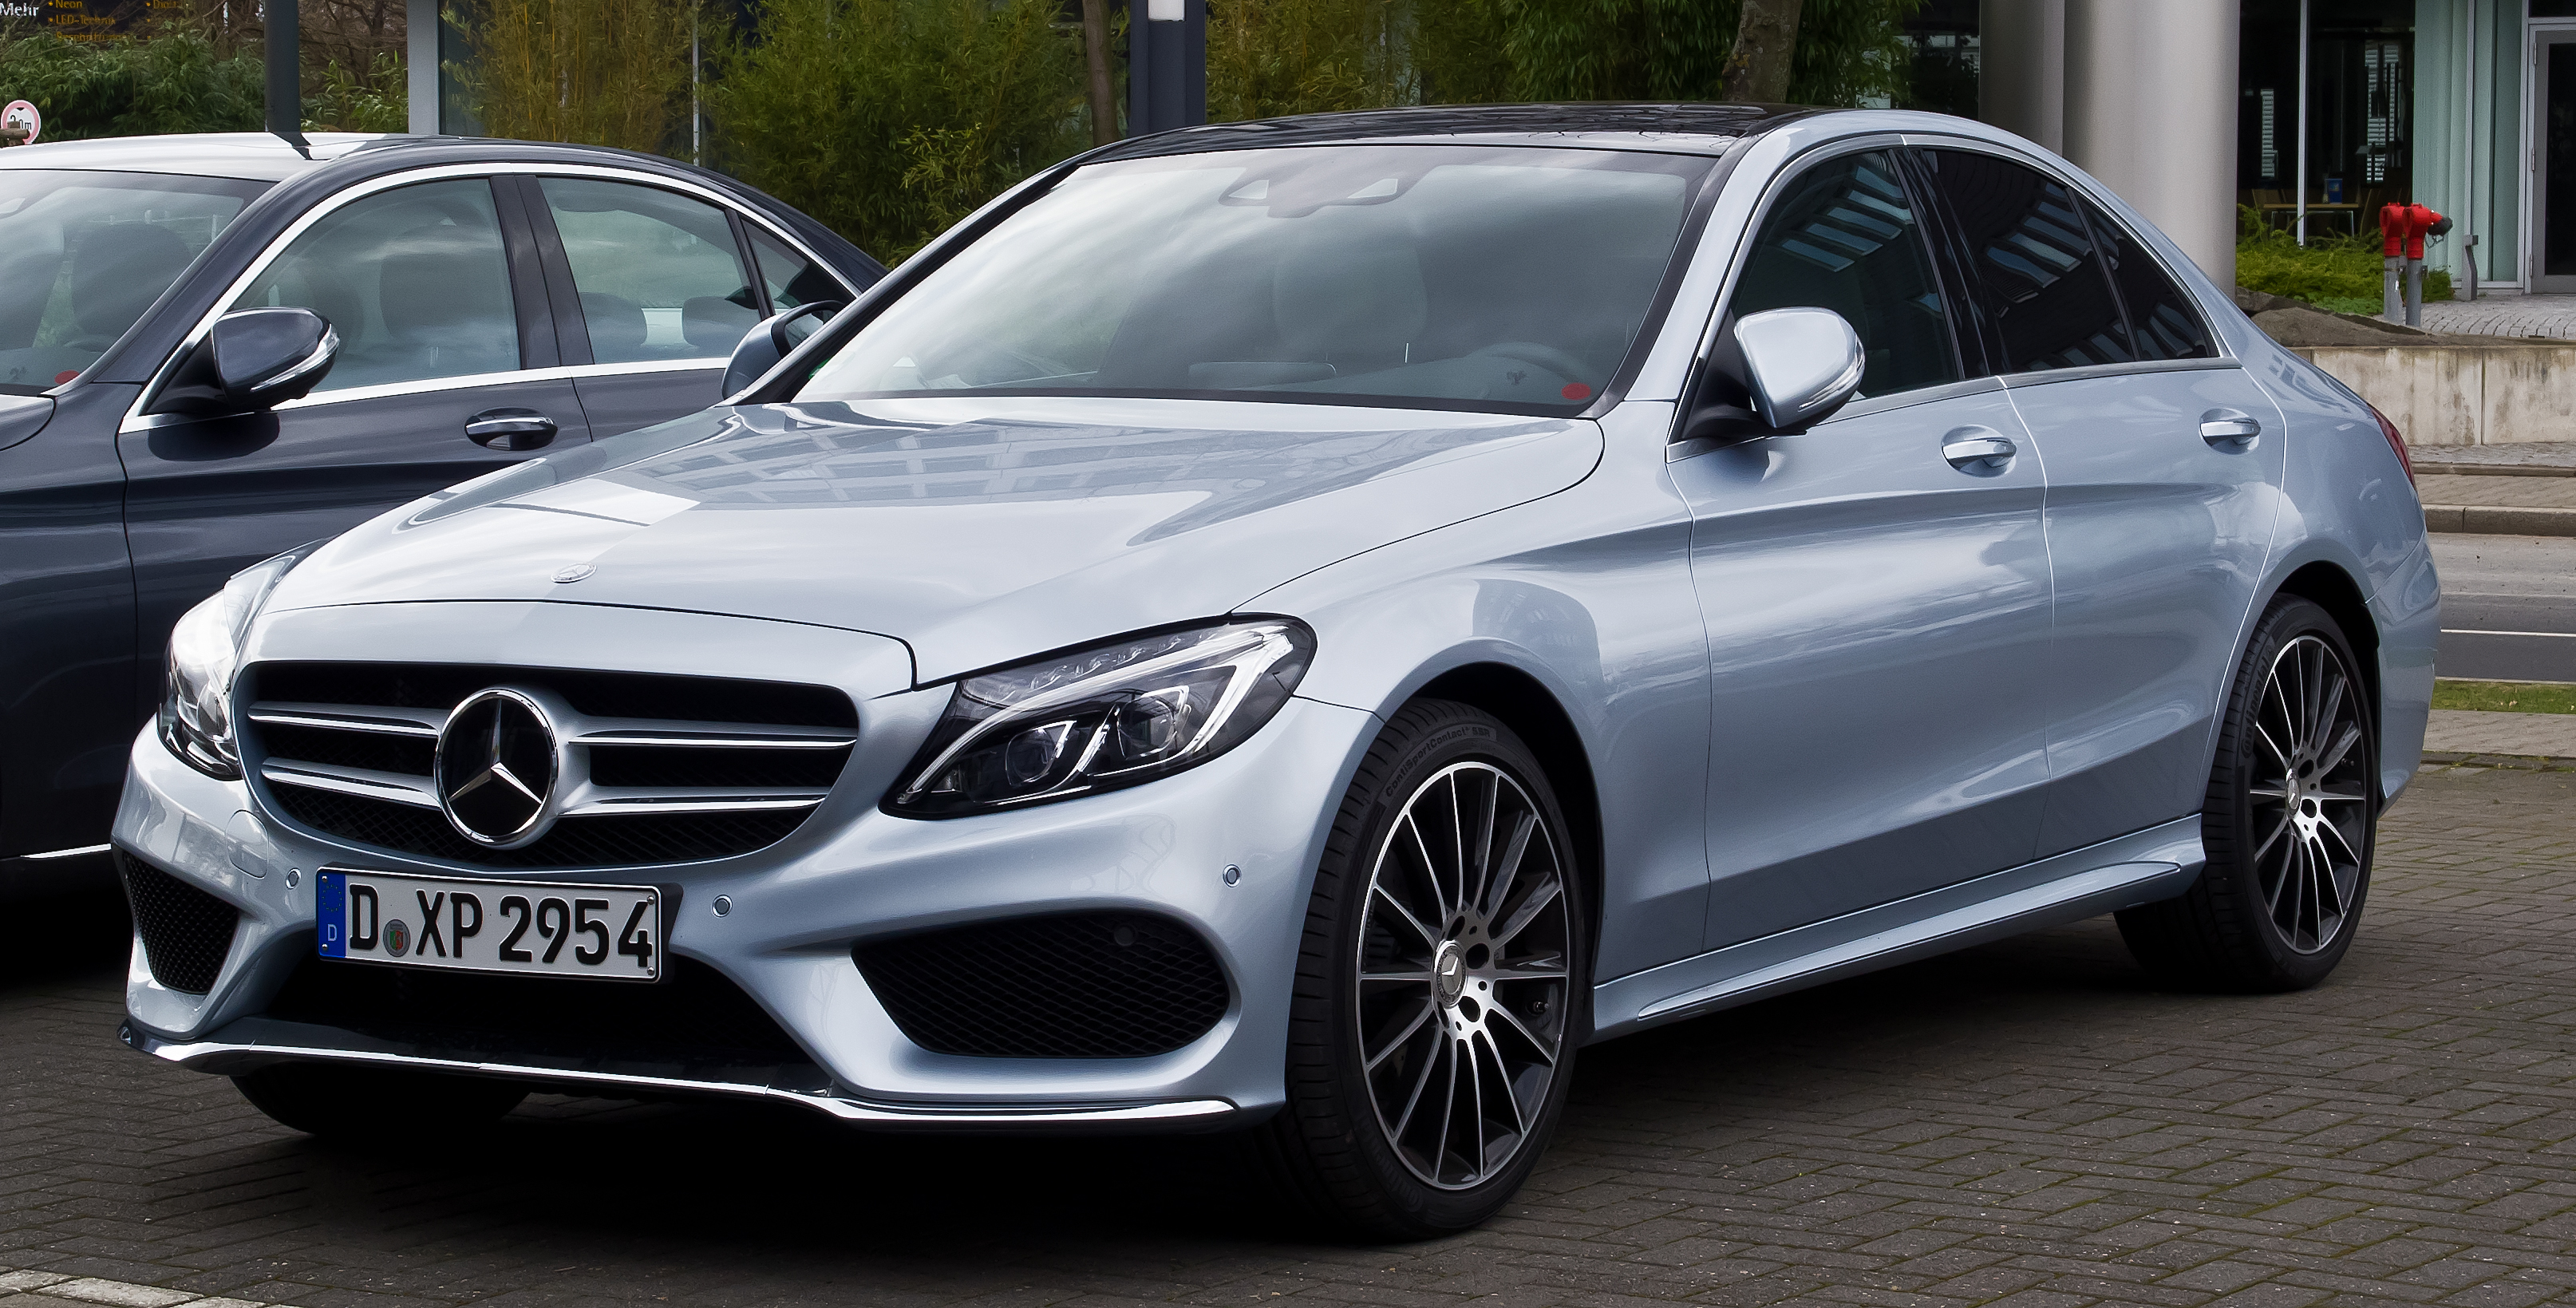 File:Mercedes-Benz C 220 BlueTEC AMG Line (W 205 ...